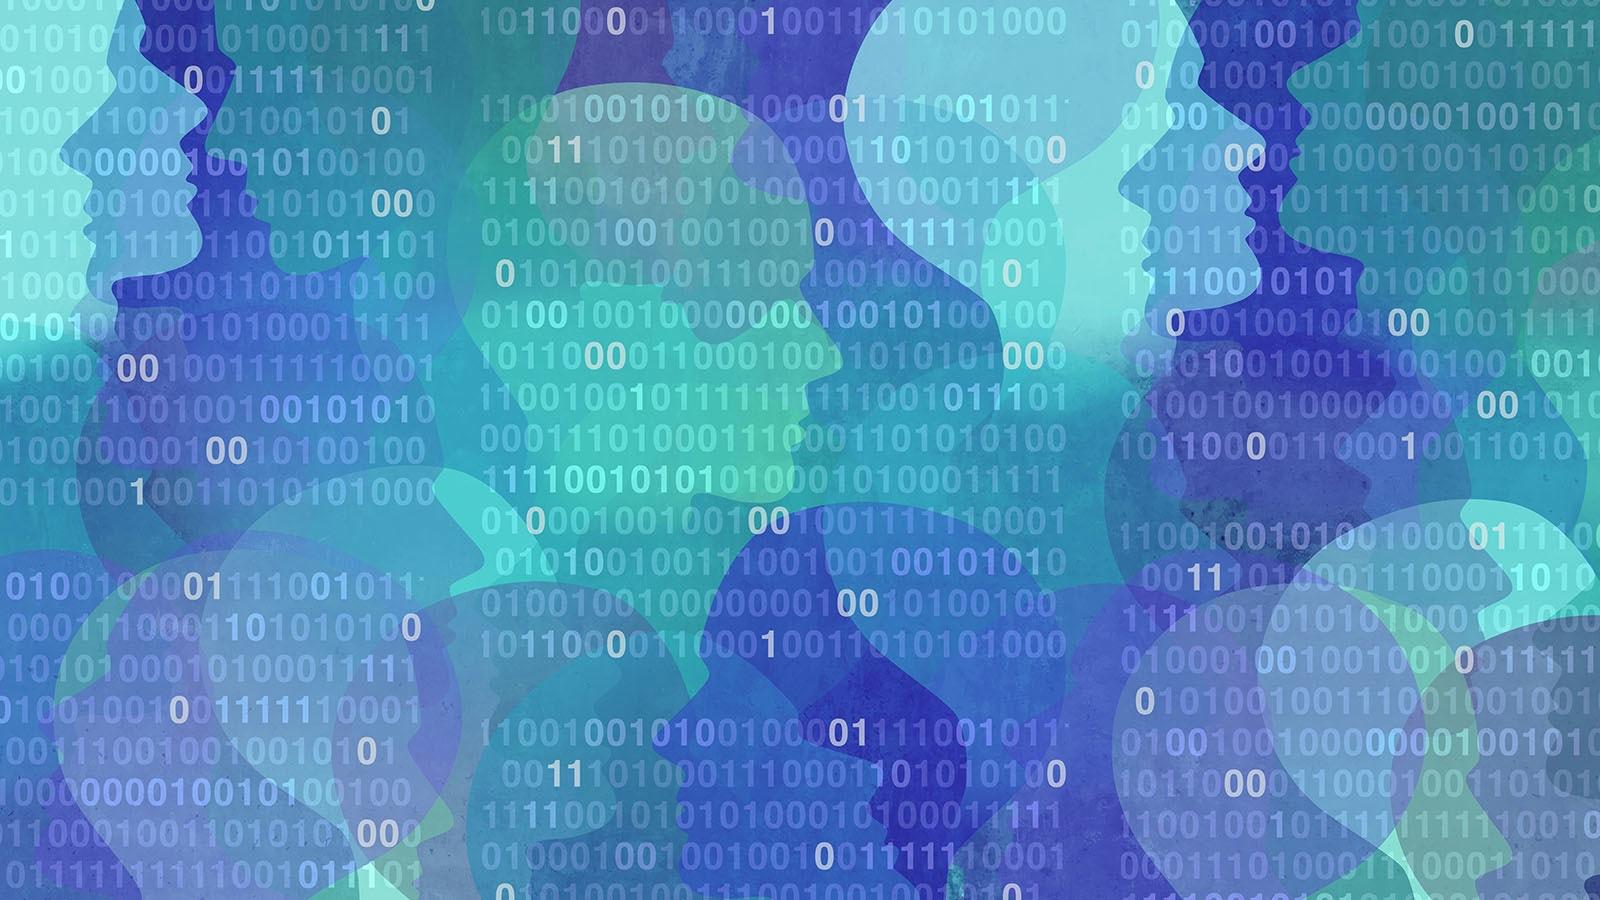 Data breach resized